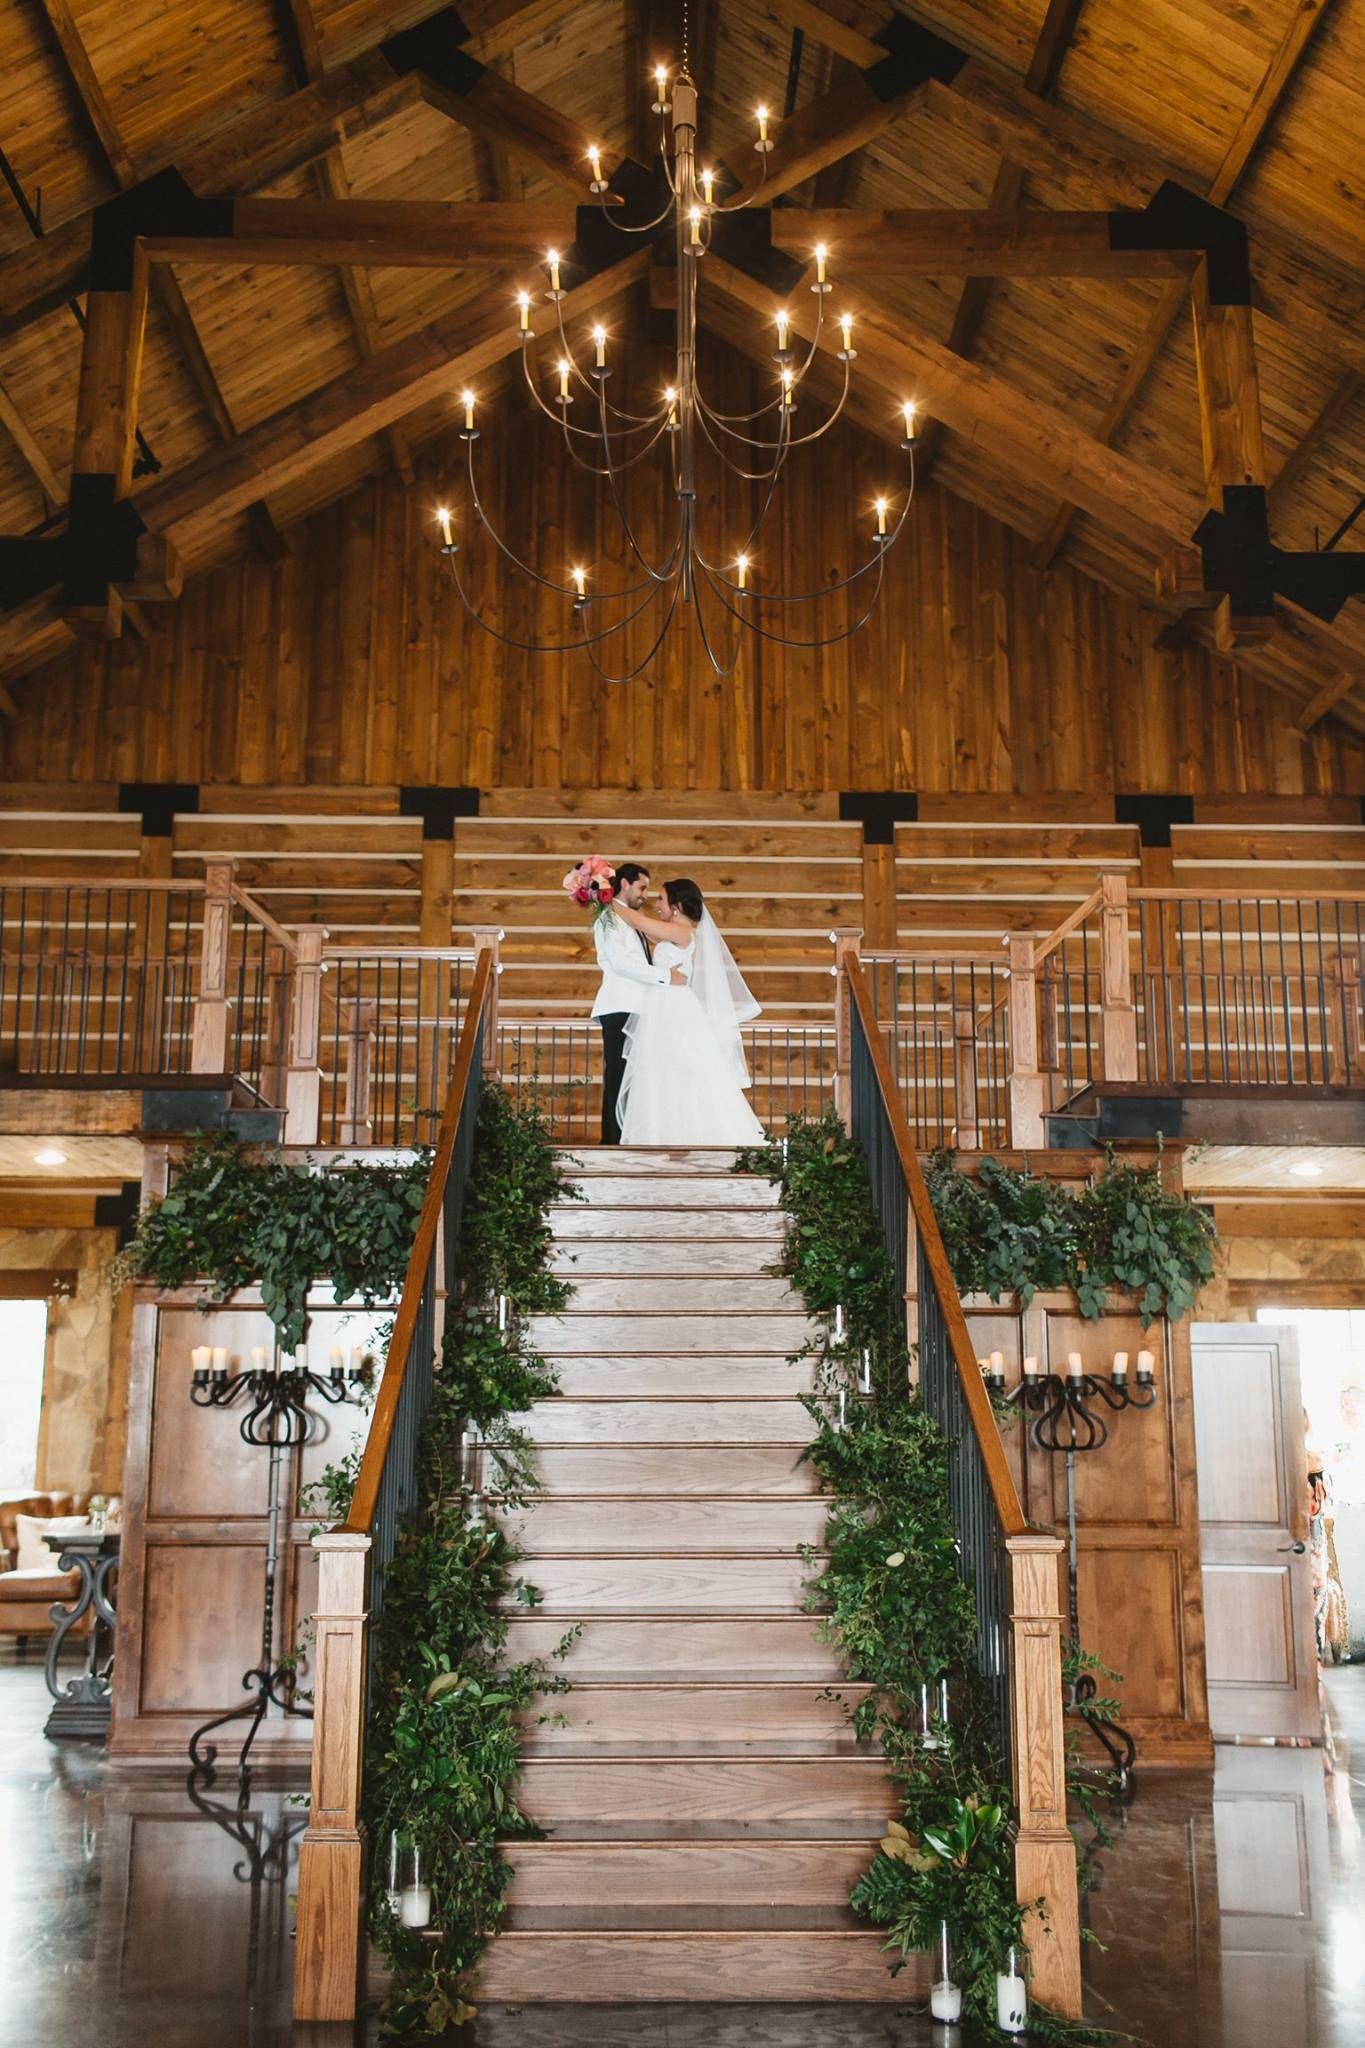 The Springs Wedding Venues Tx Ok Locations Wedding Venues Texas Dallas Wedding Venues Oklahoma Wedding Venues